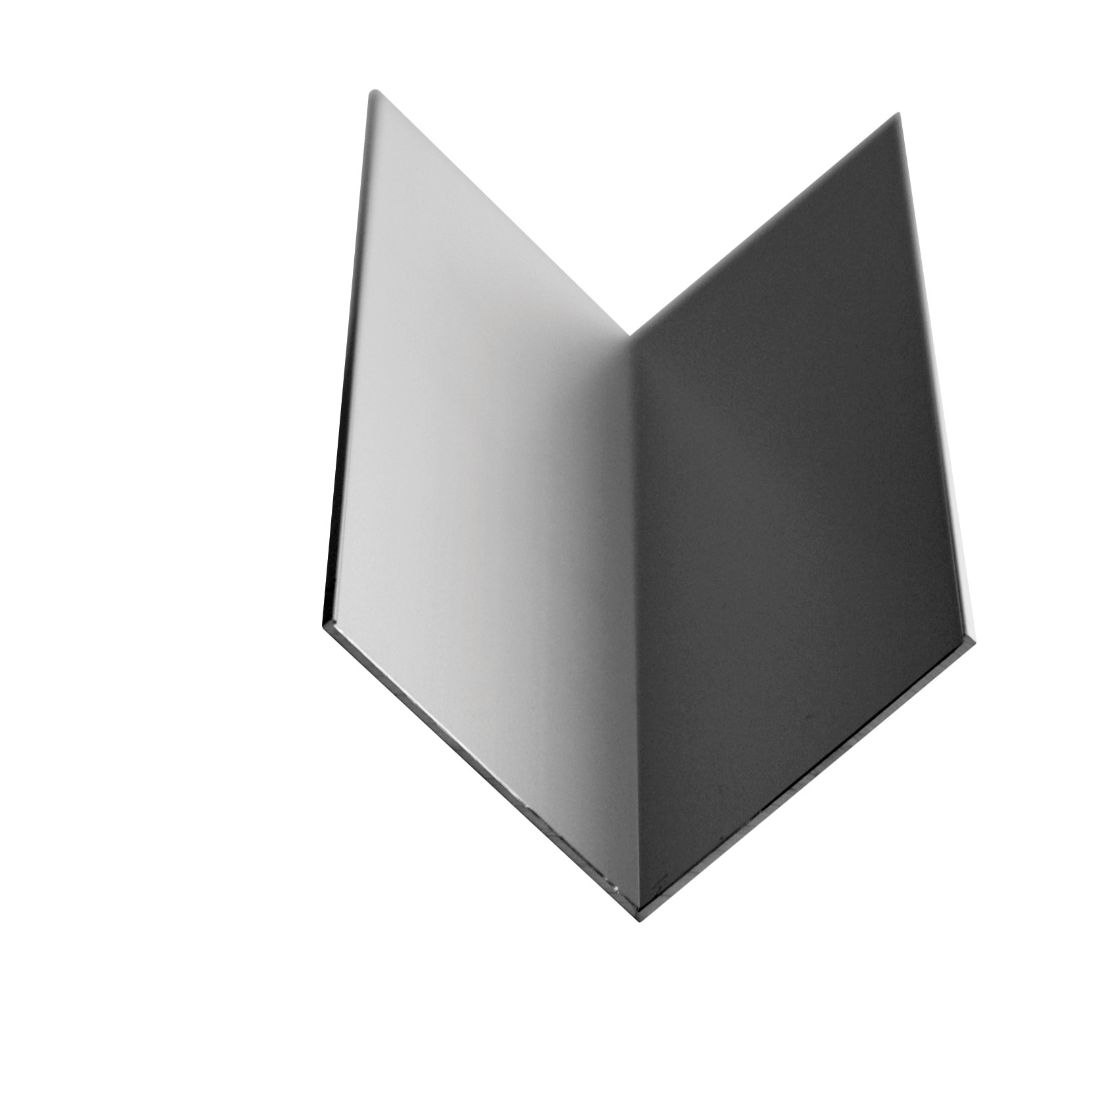 Internal 90 Angle Aluminium Flashing 3.0m